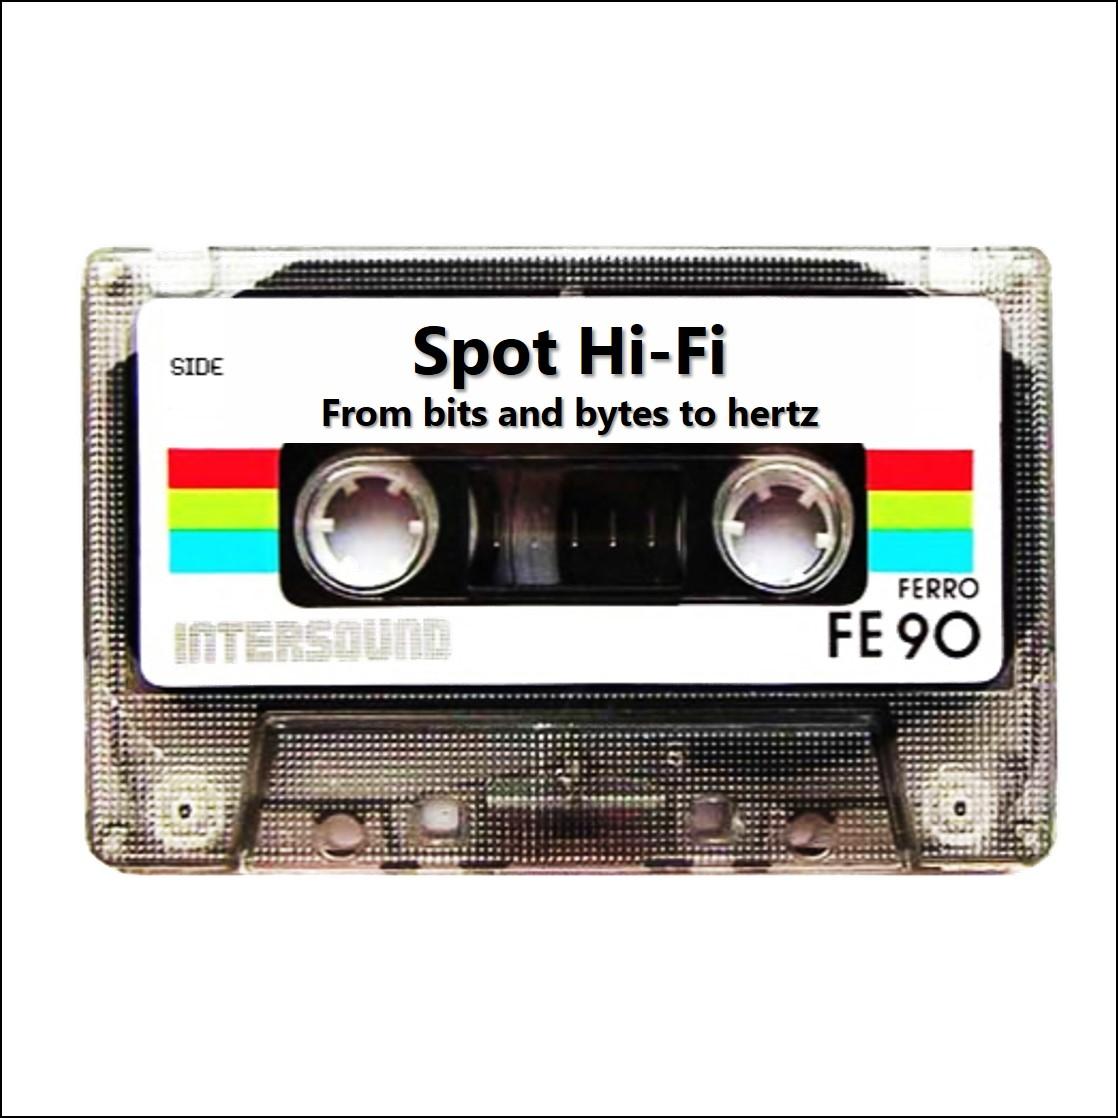 imagem do programa Spot Hi-Fi